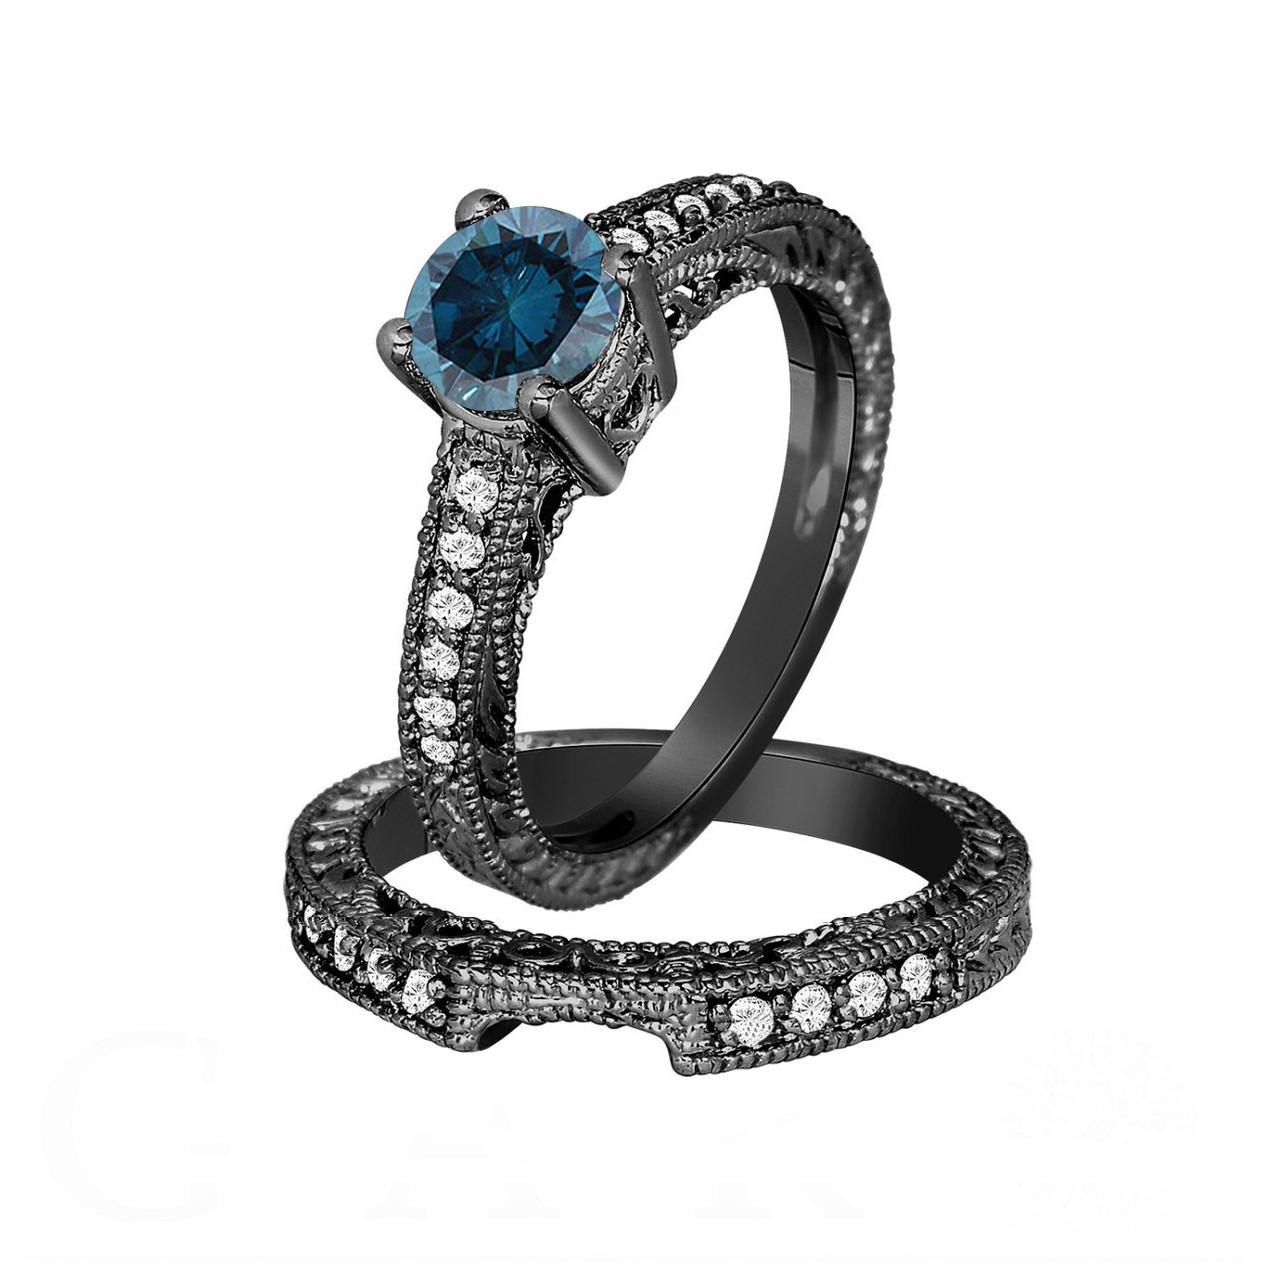 Fancy Blue Diamond Engagement Ring And Wedding Band Sets 14k Black Gold 1 26 Carat Antique Vintage Style Engraved